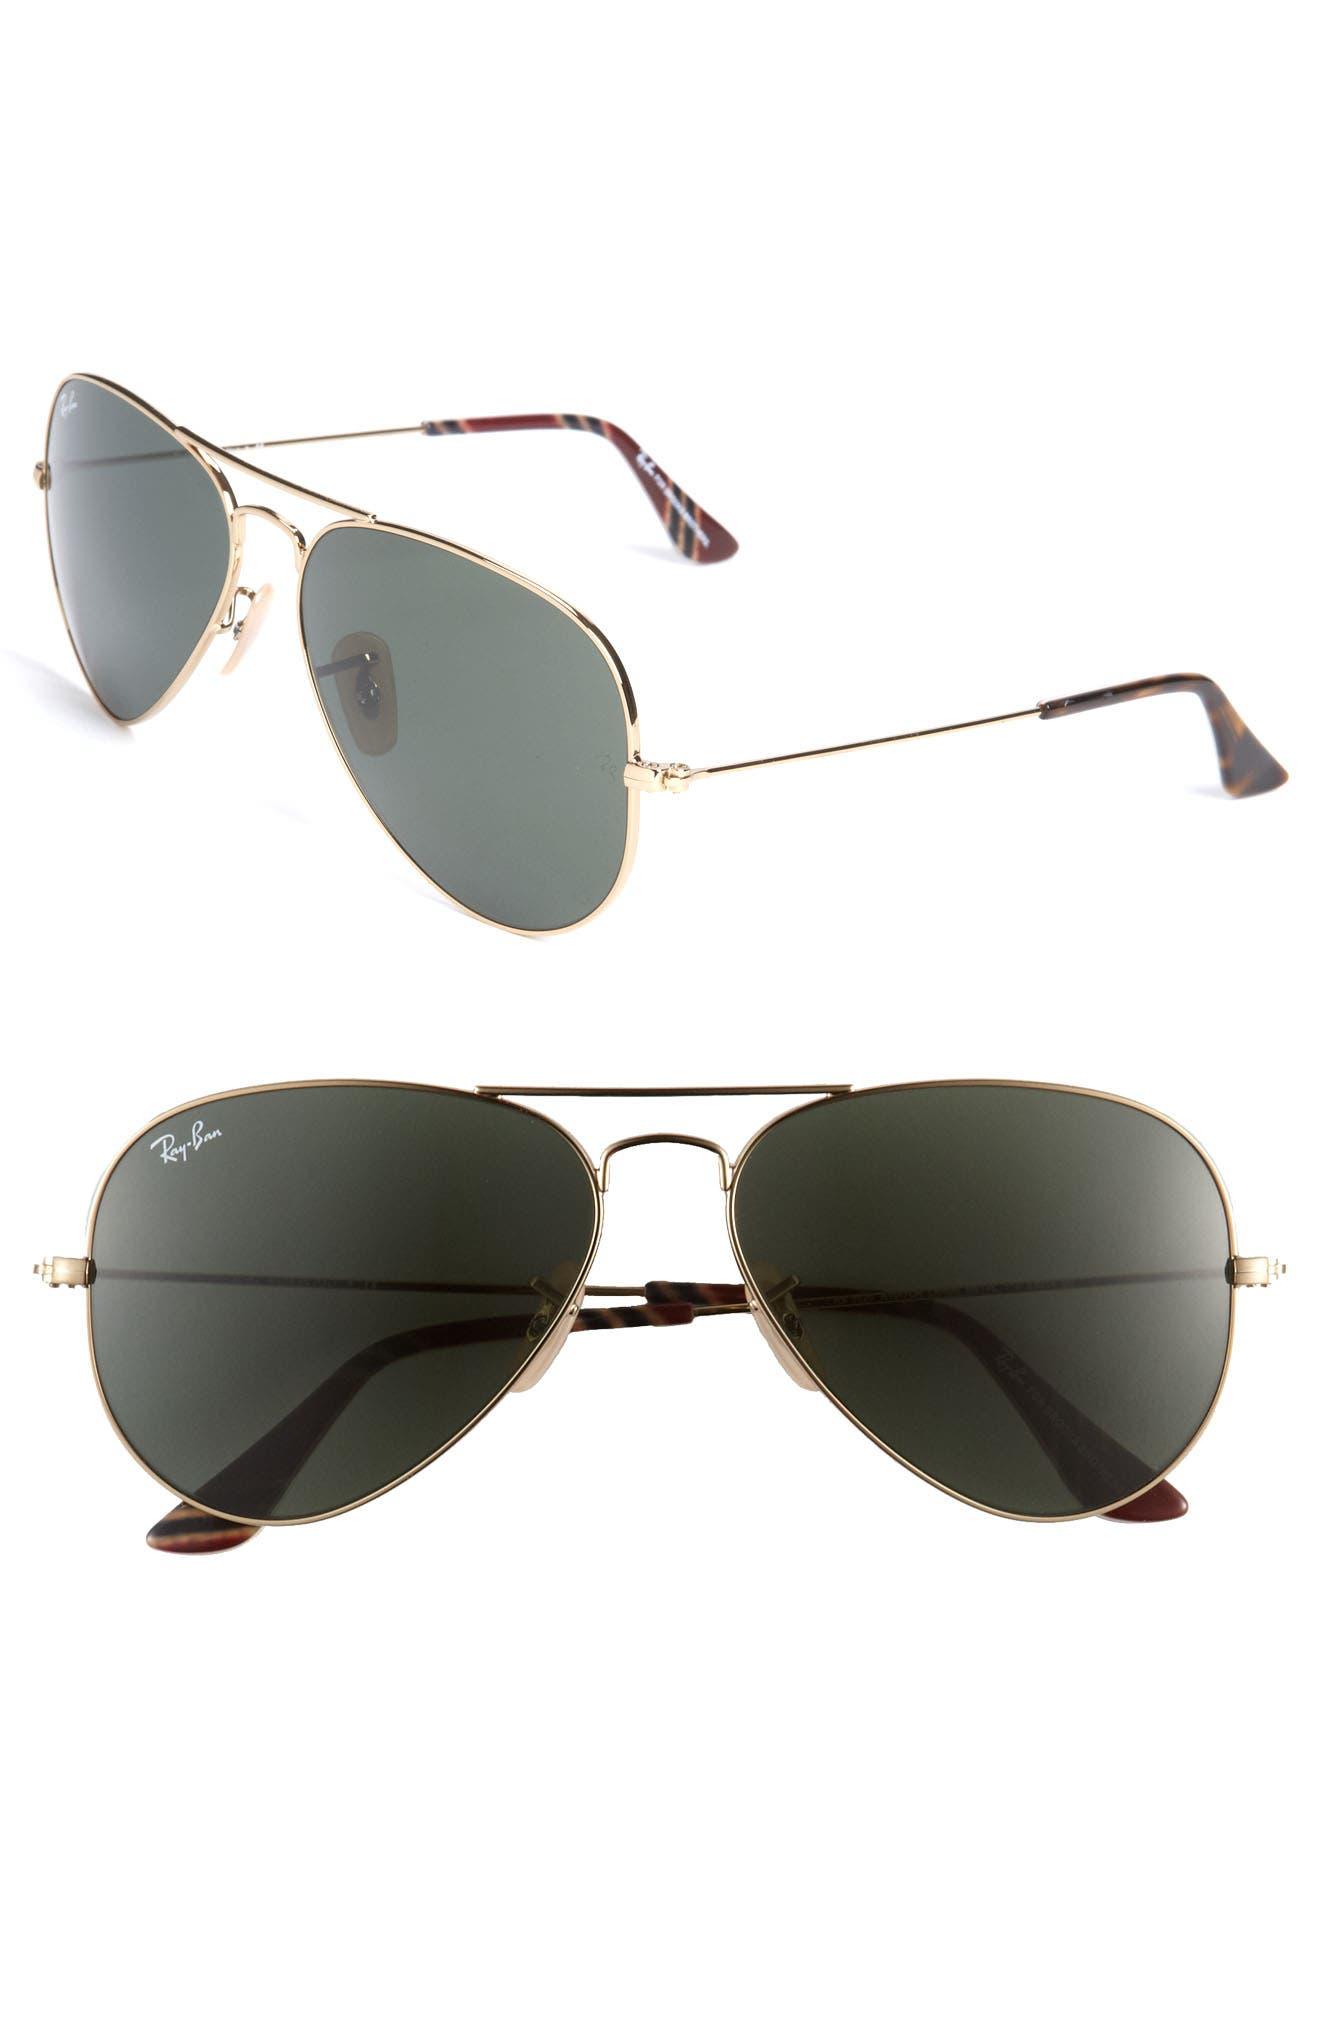 Original Aviator 58mm Sunglasses,                             Main thumbnail 1, color,                             011